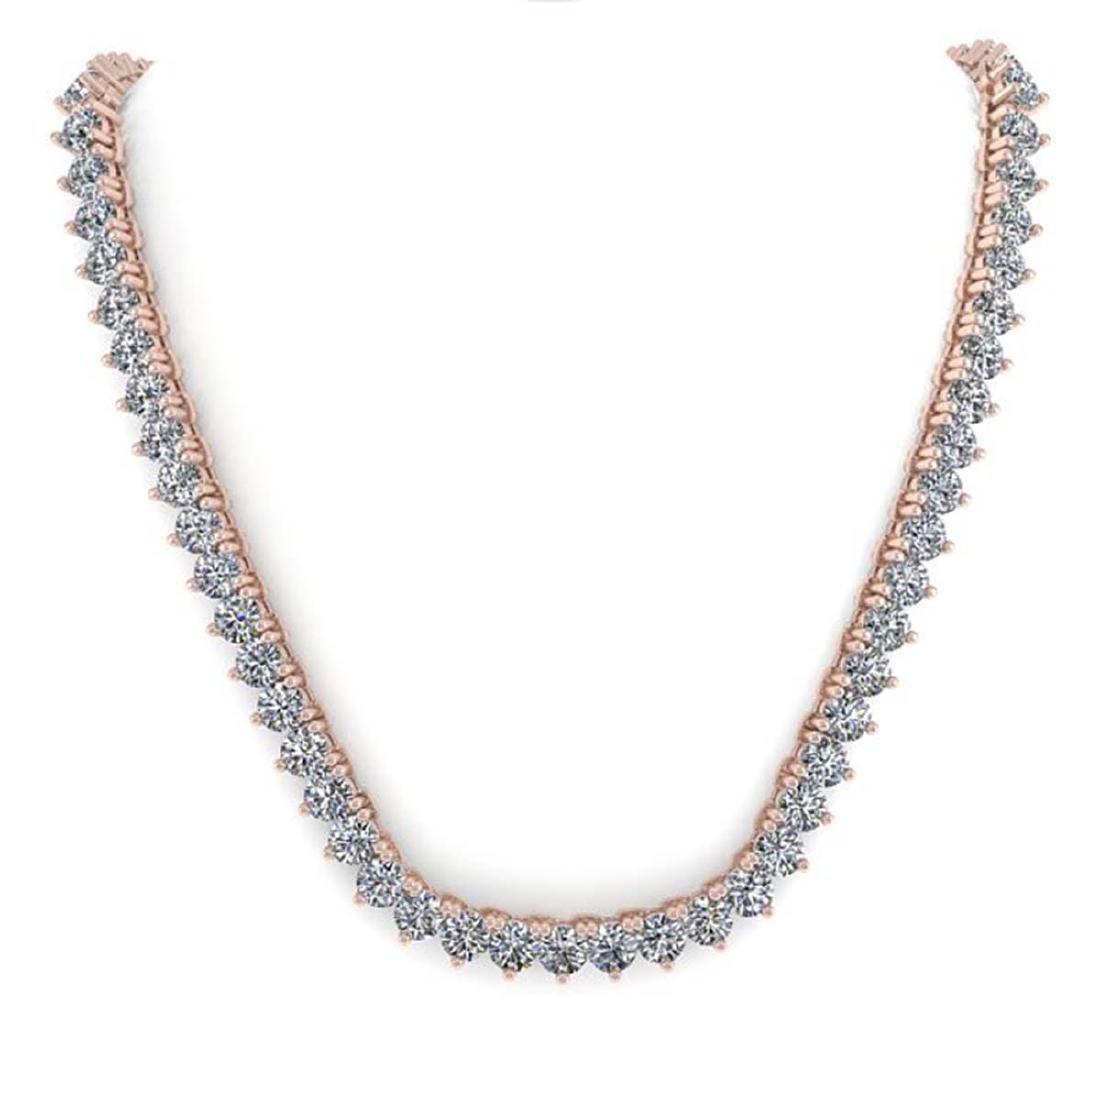 20 CTW Solitaire VS/SI Diamond Necklace 18K Rose Gold - - 3